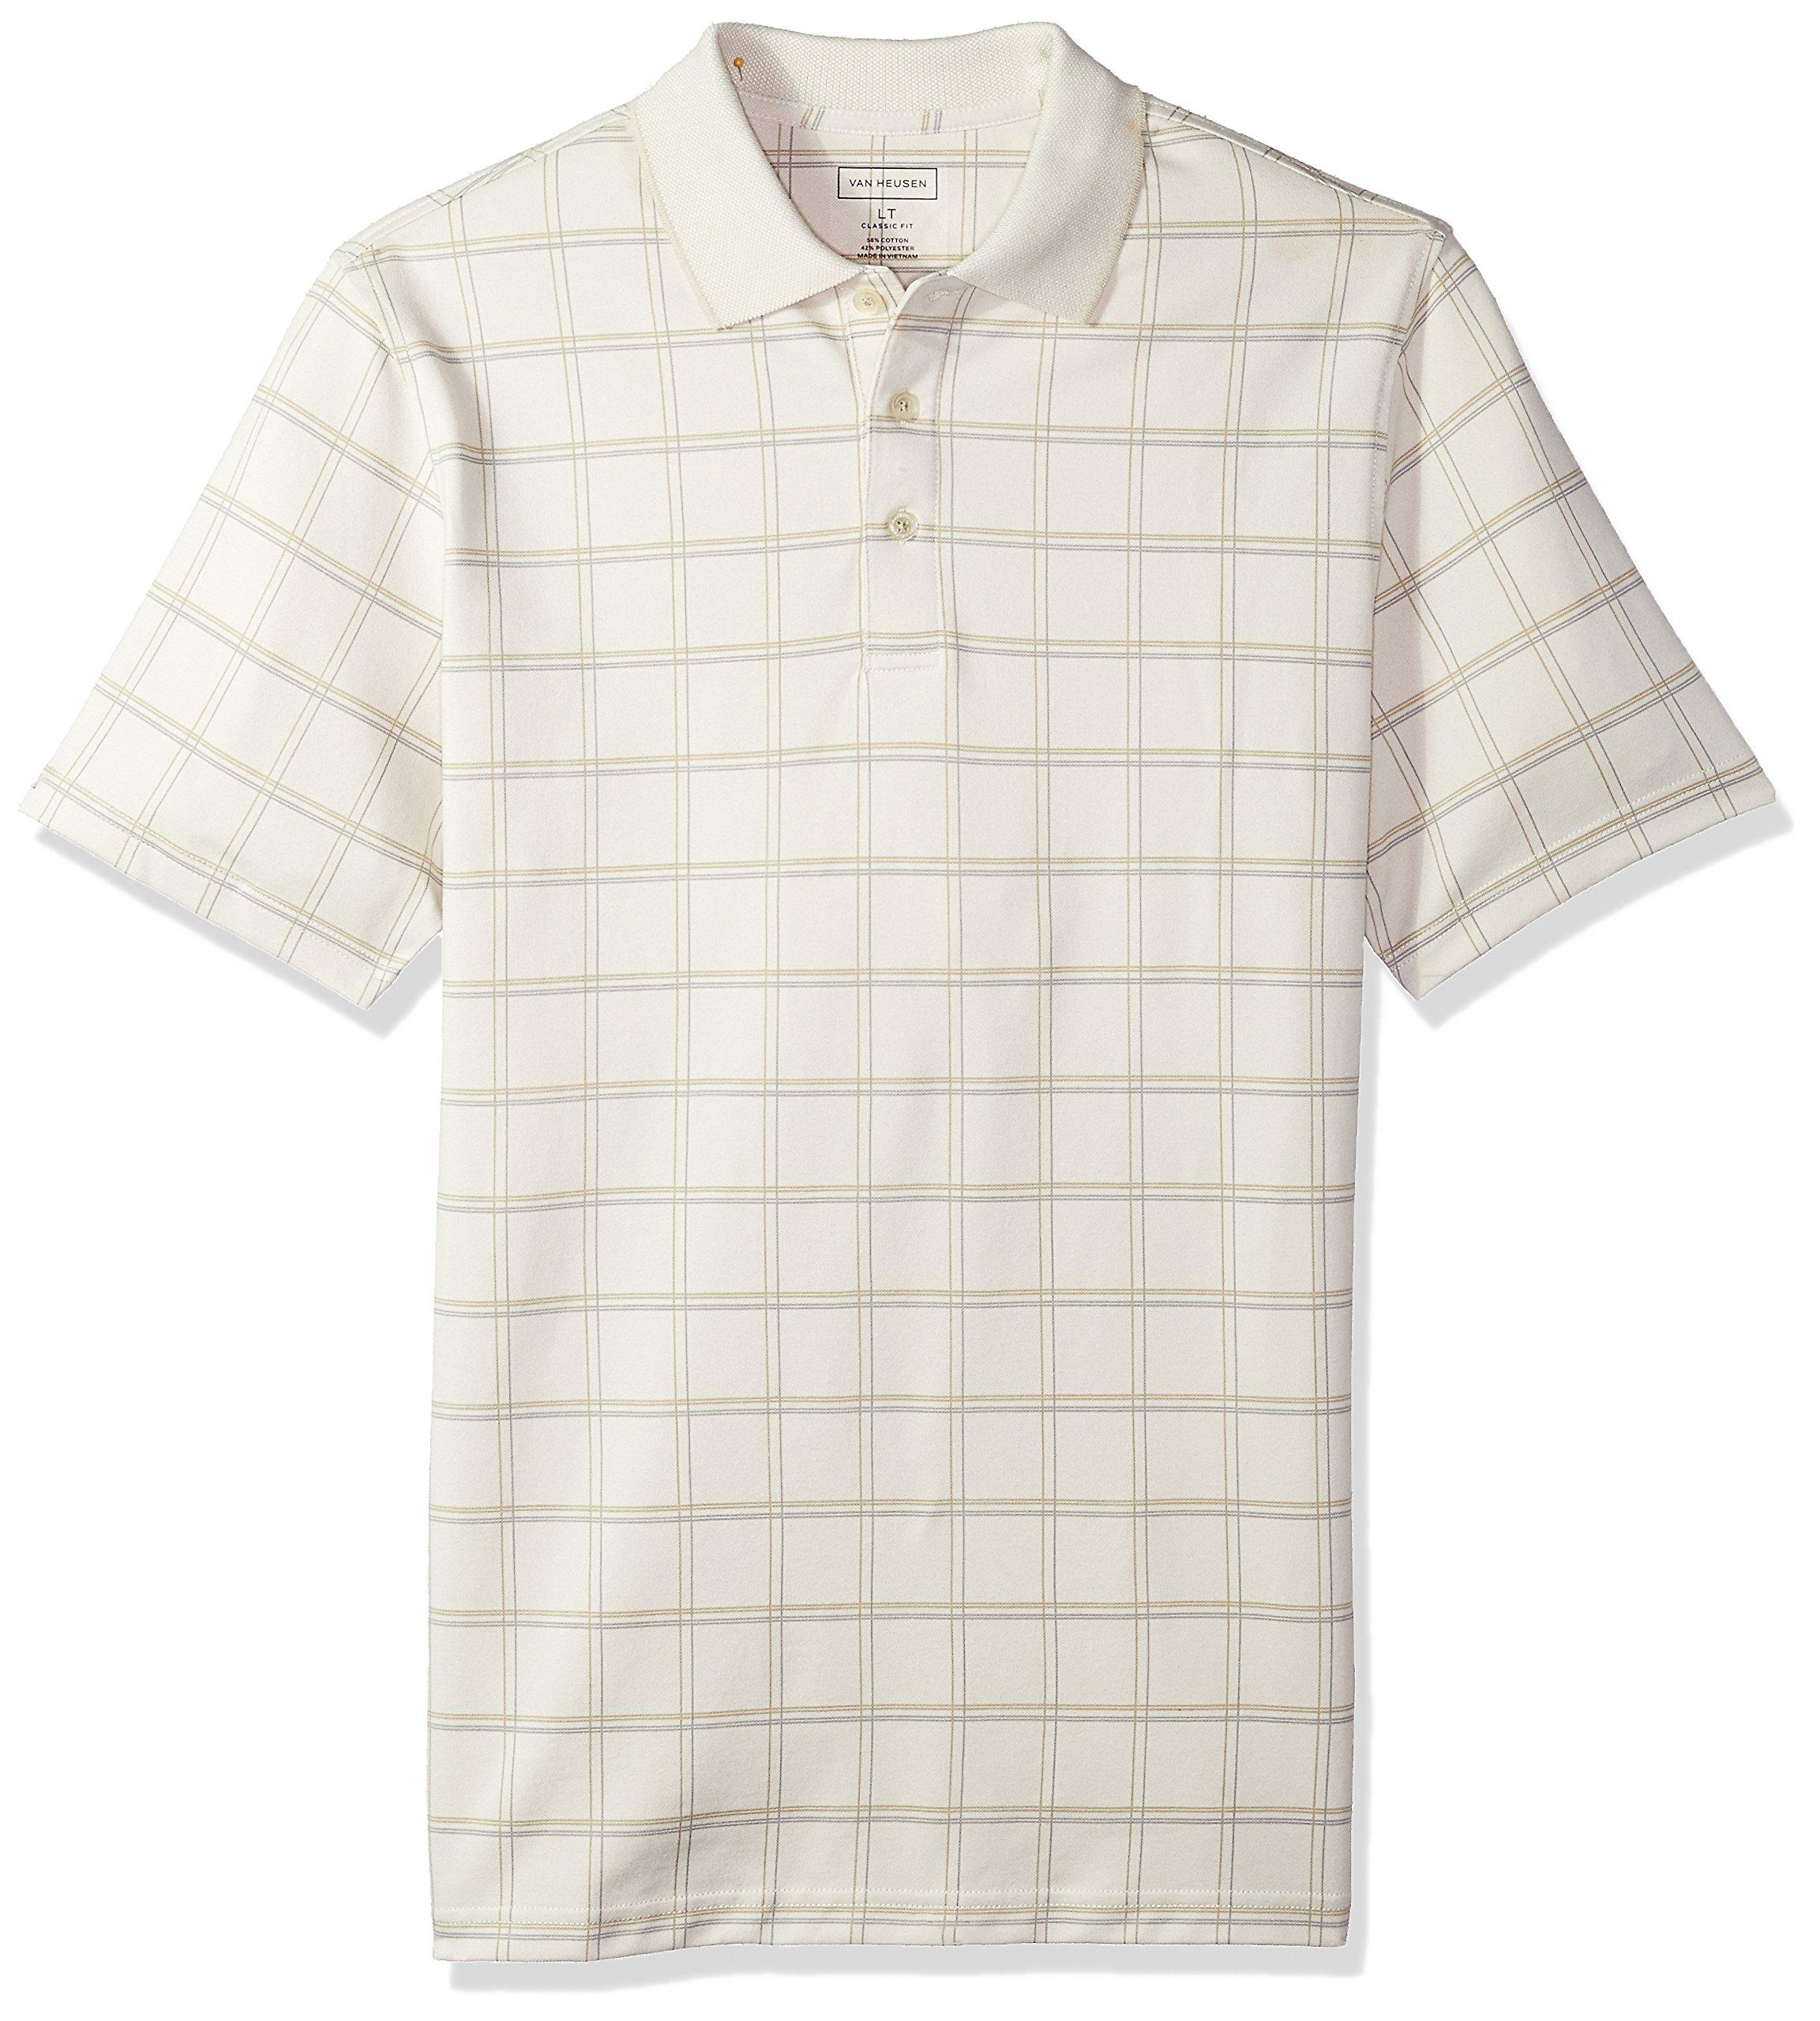 Van Heusen Men's Size Big and Tall Short Sleeve Windowpane Polo Shirt, Silver Birch, 4X-Large Tall